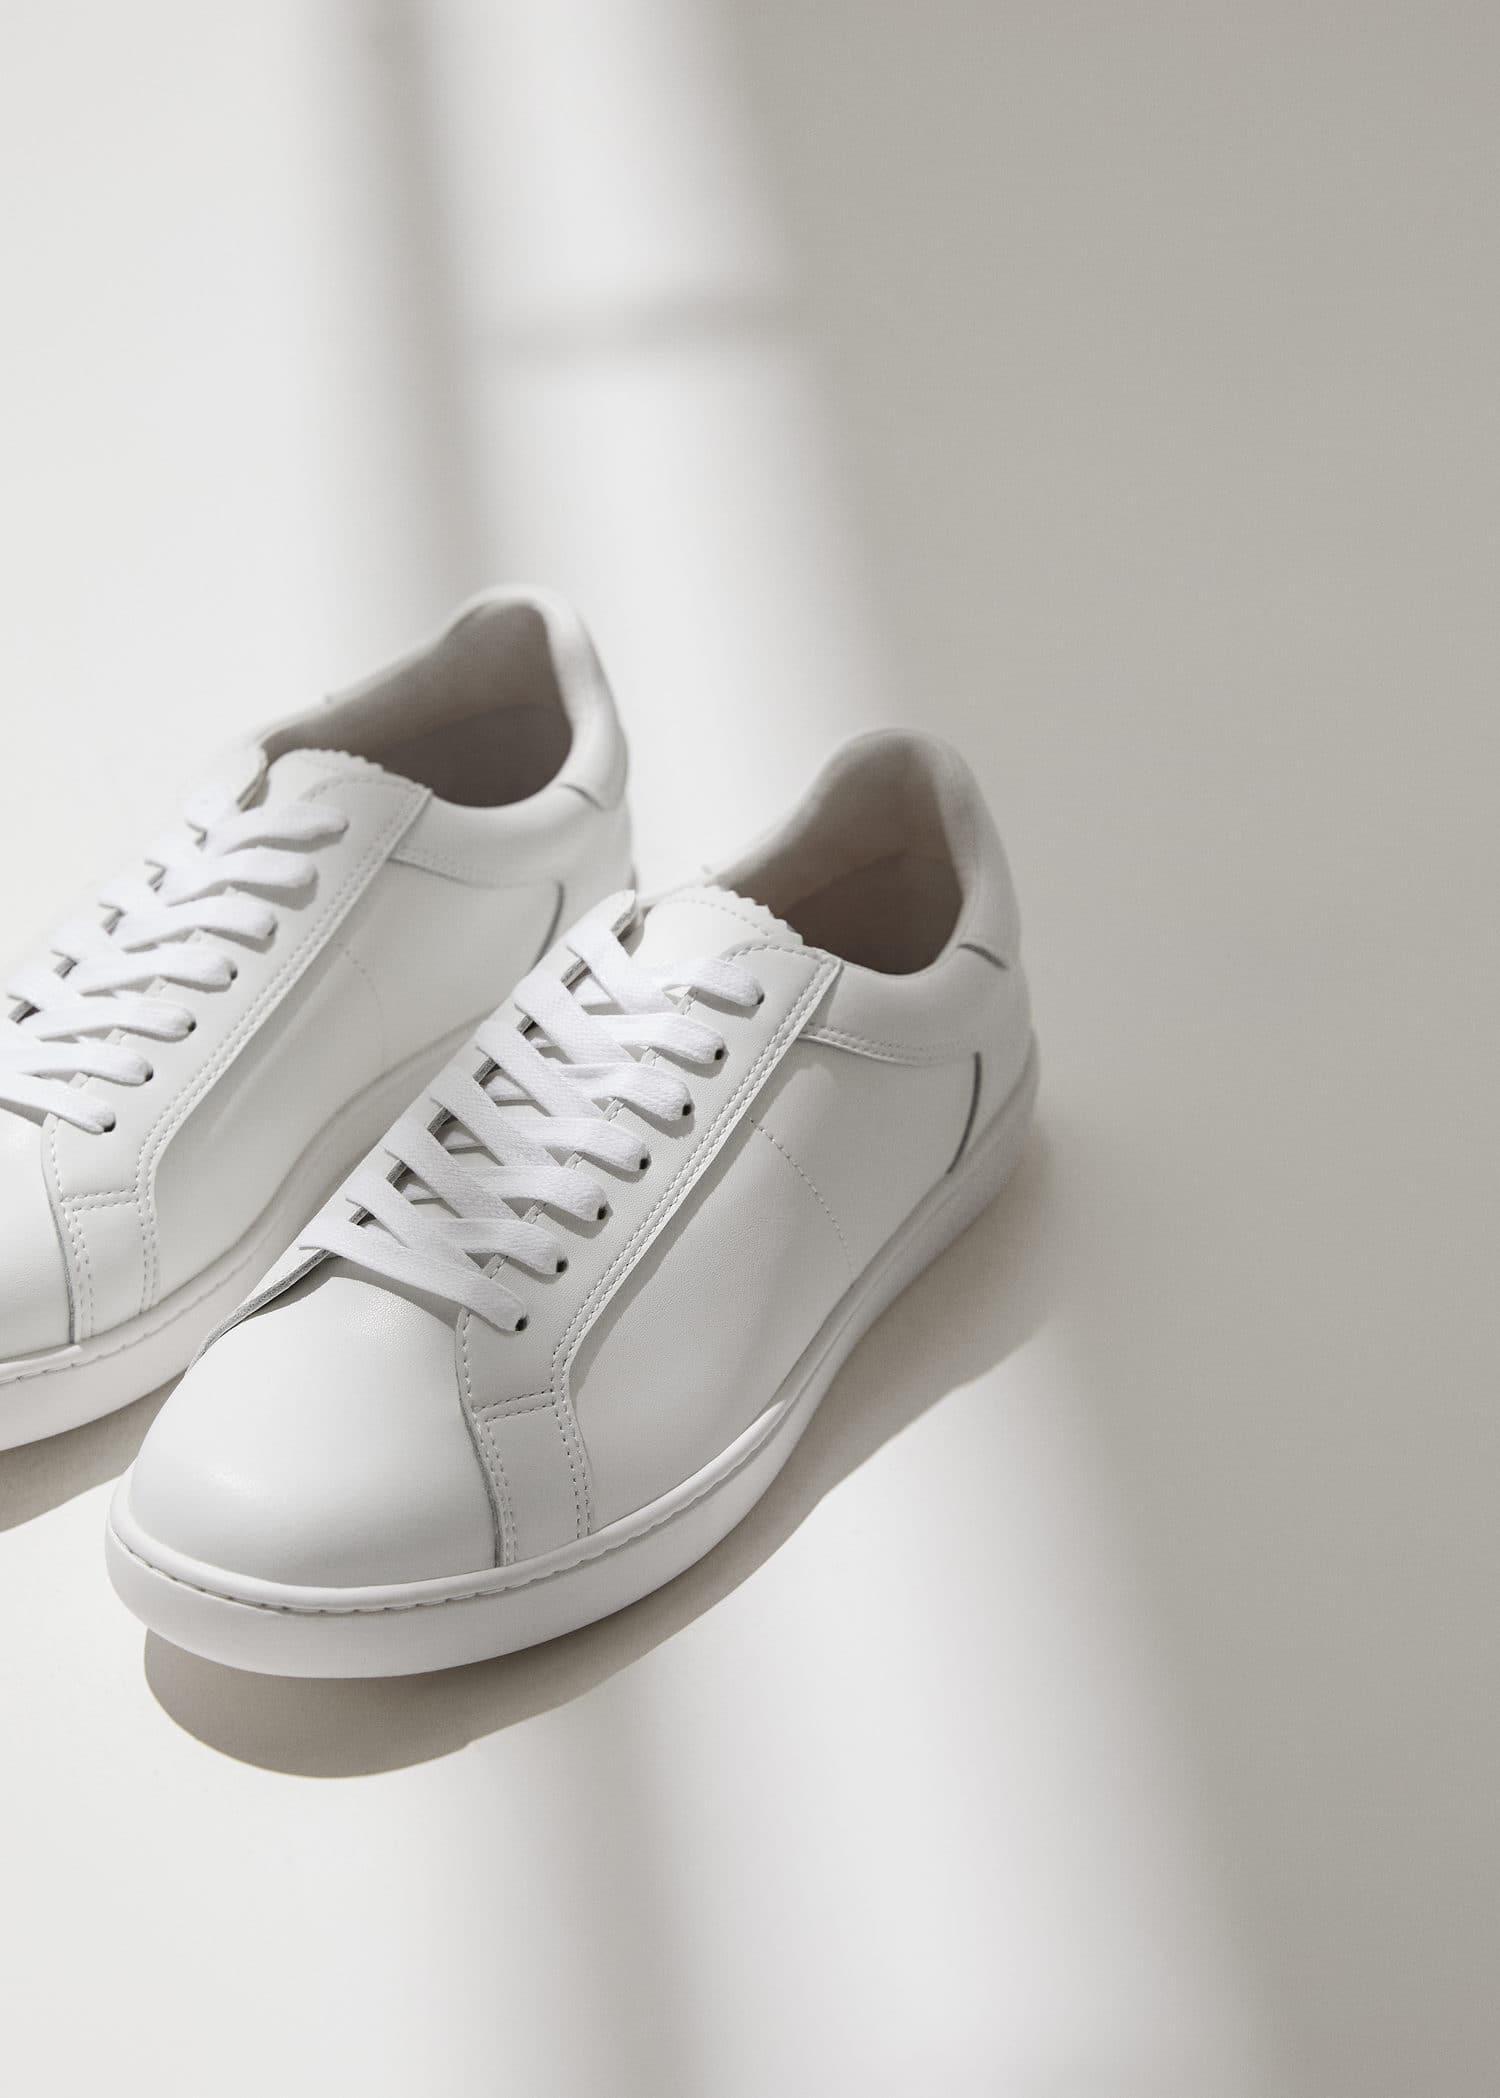 Shoes for Man 2020 | Mango Man Vietnam